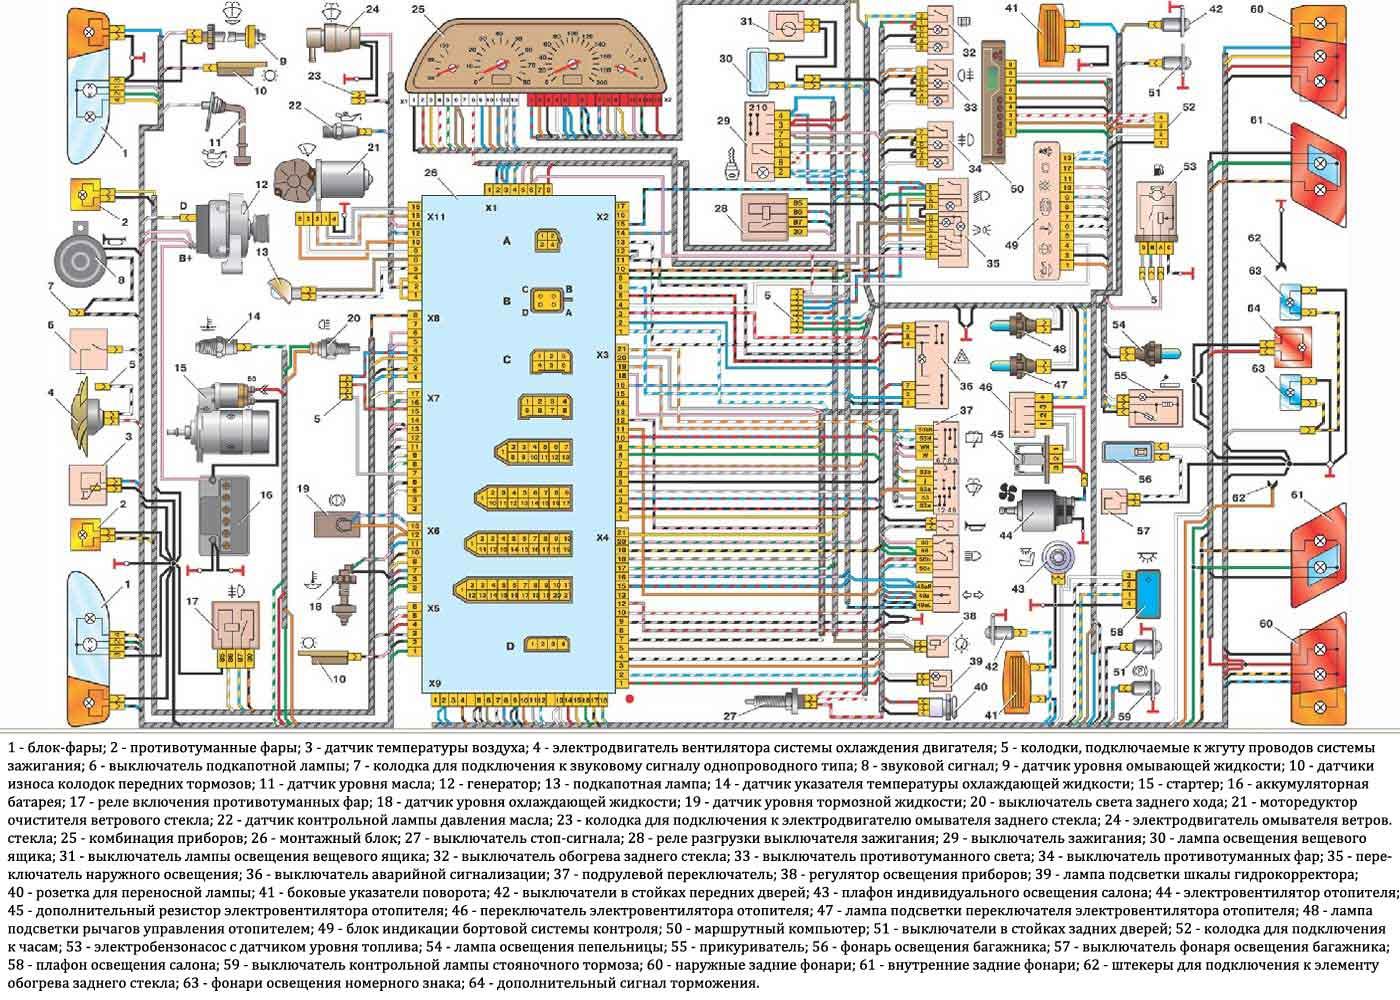 Shema jelektrooborudovanija VAZ 2114 - Схема проводки салона ваз 2114